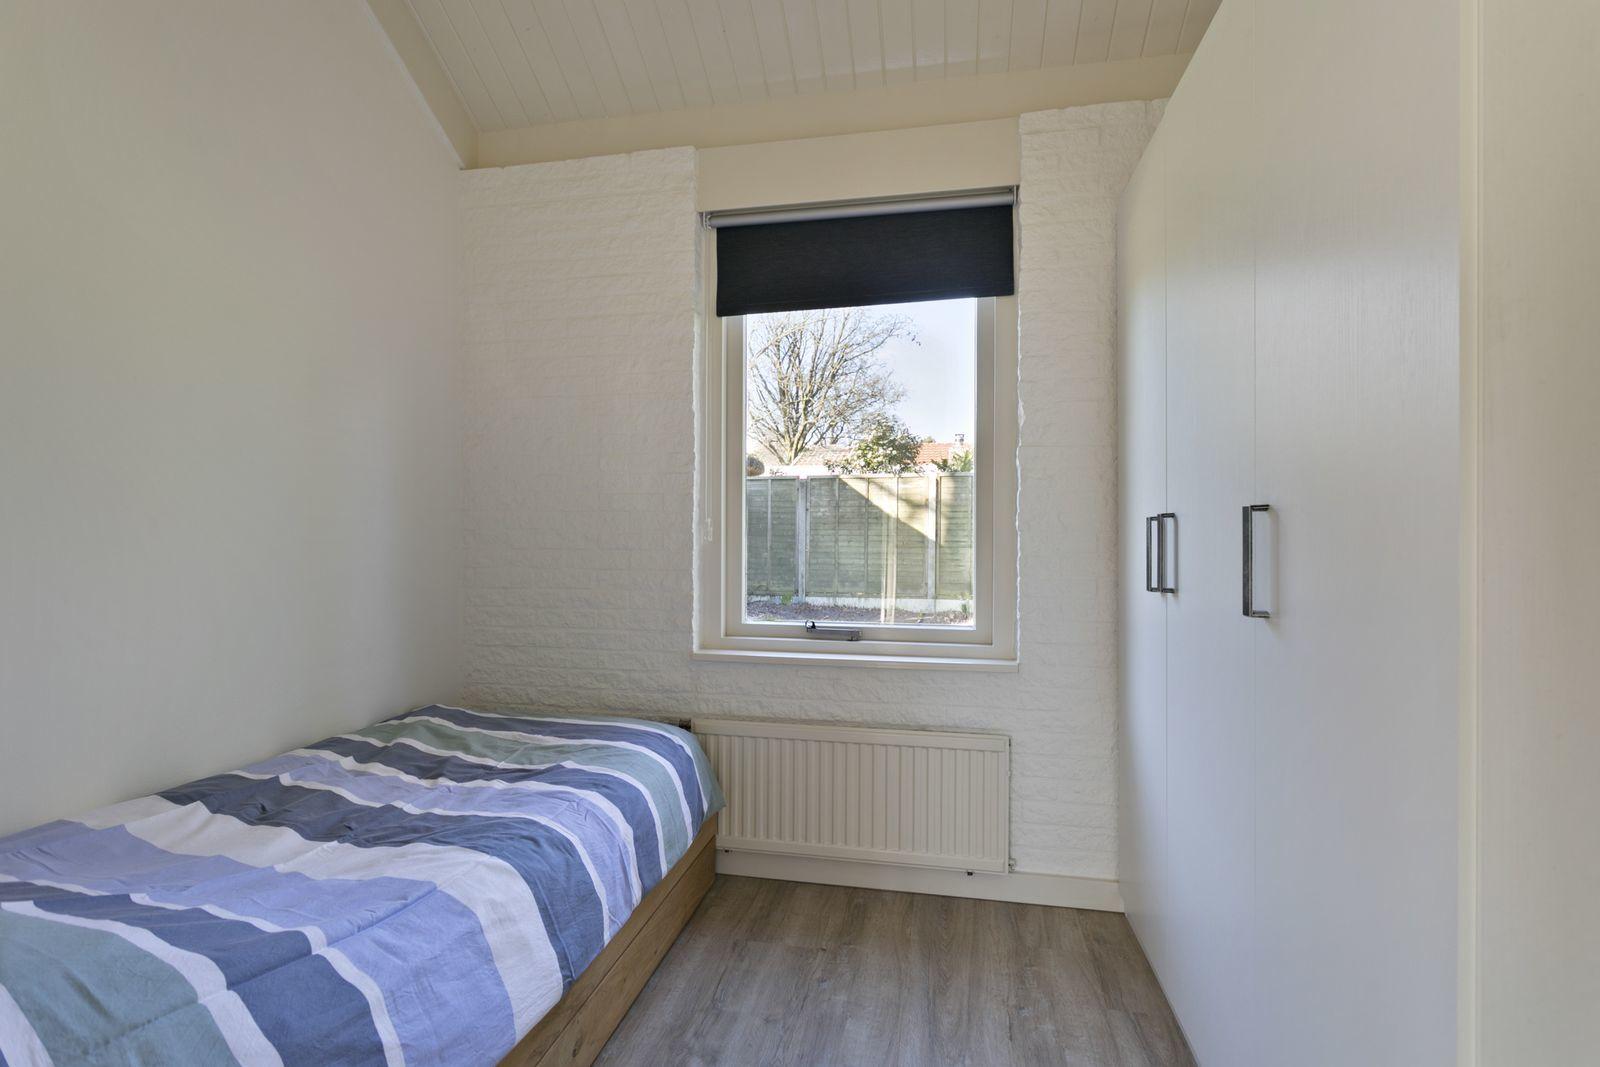 Prinsenhof 29 - Ouddorp De Kriekel